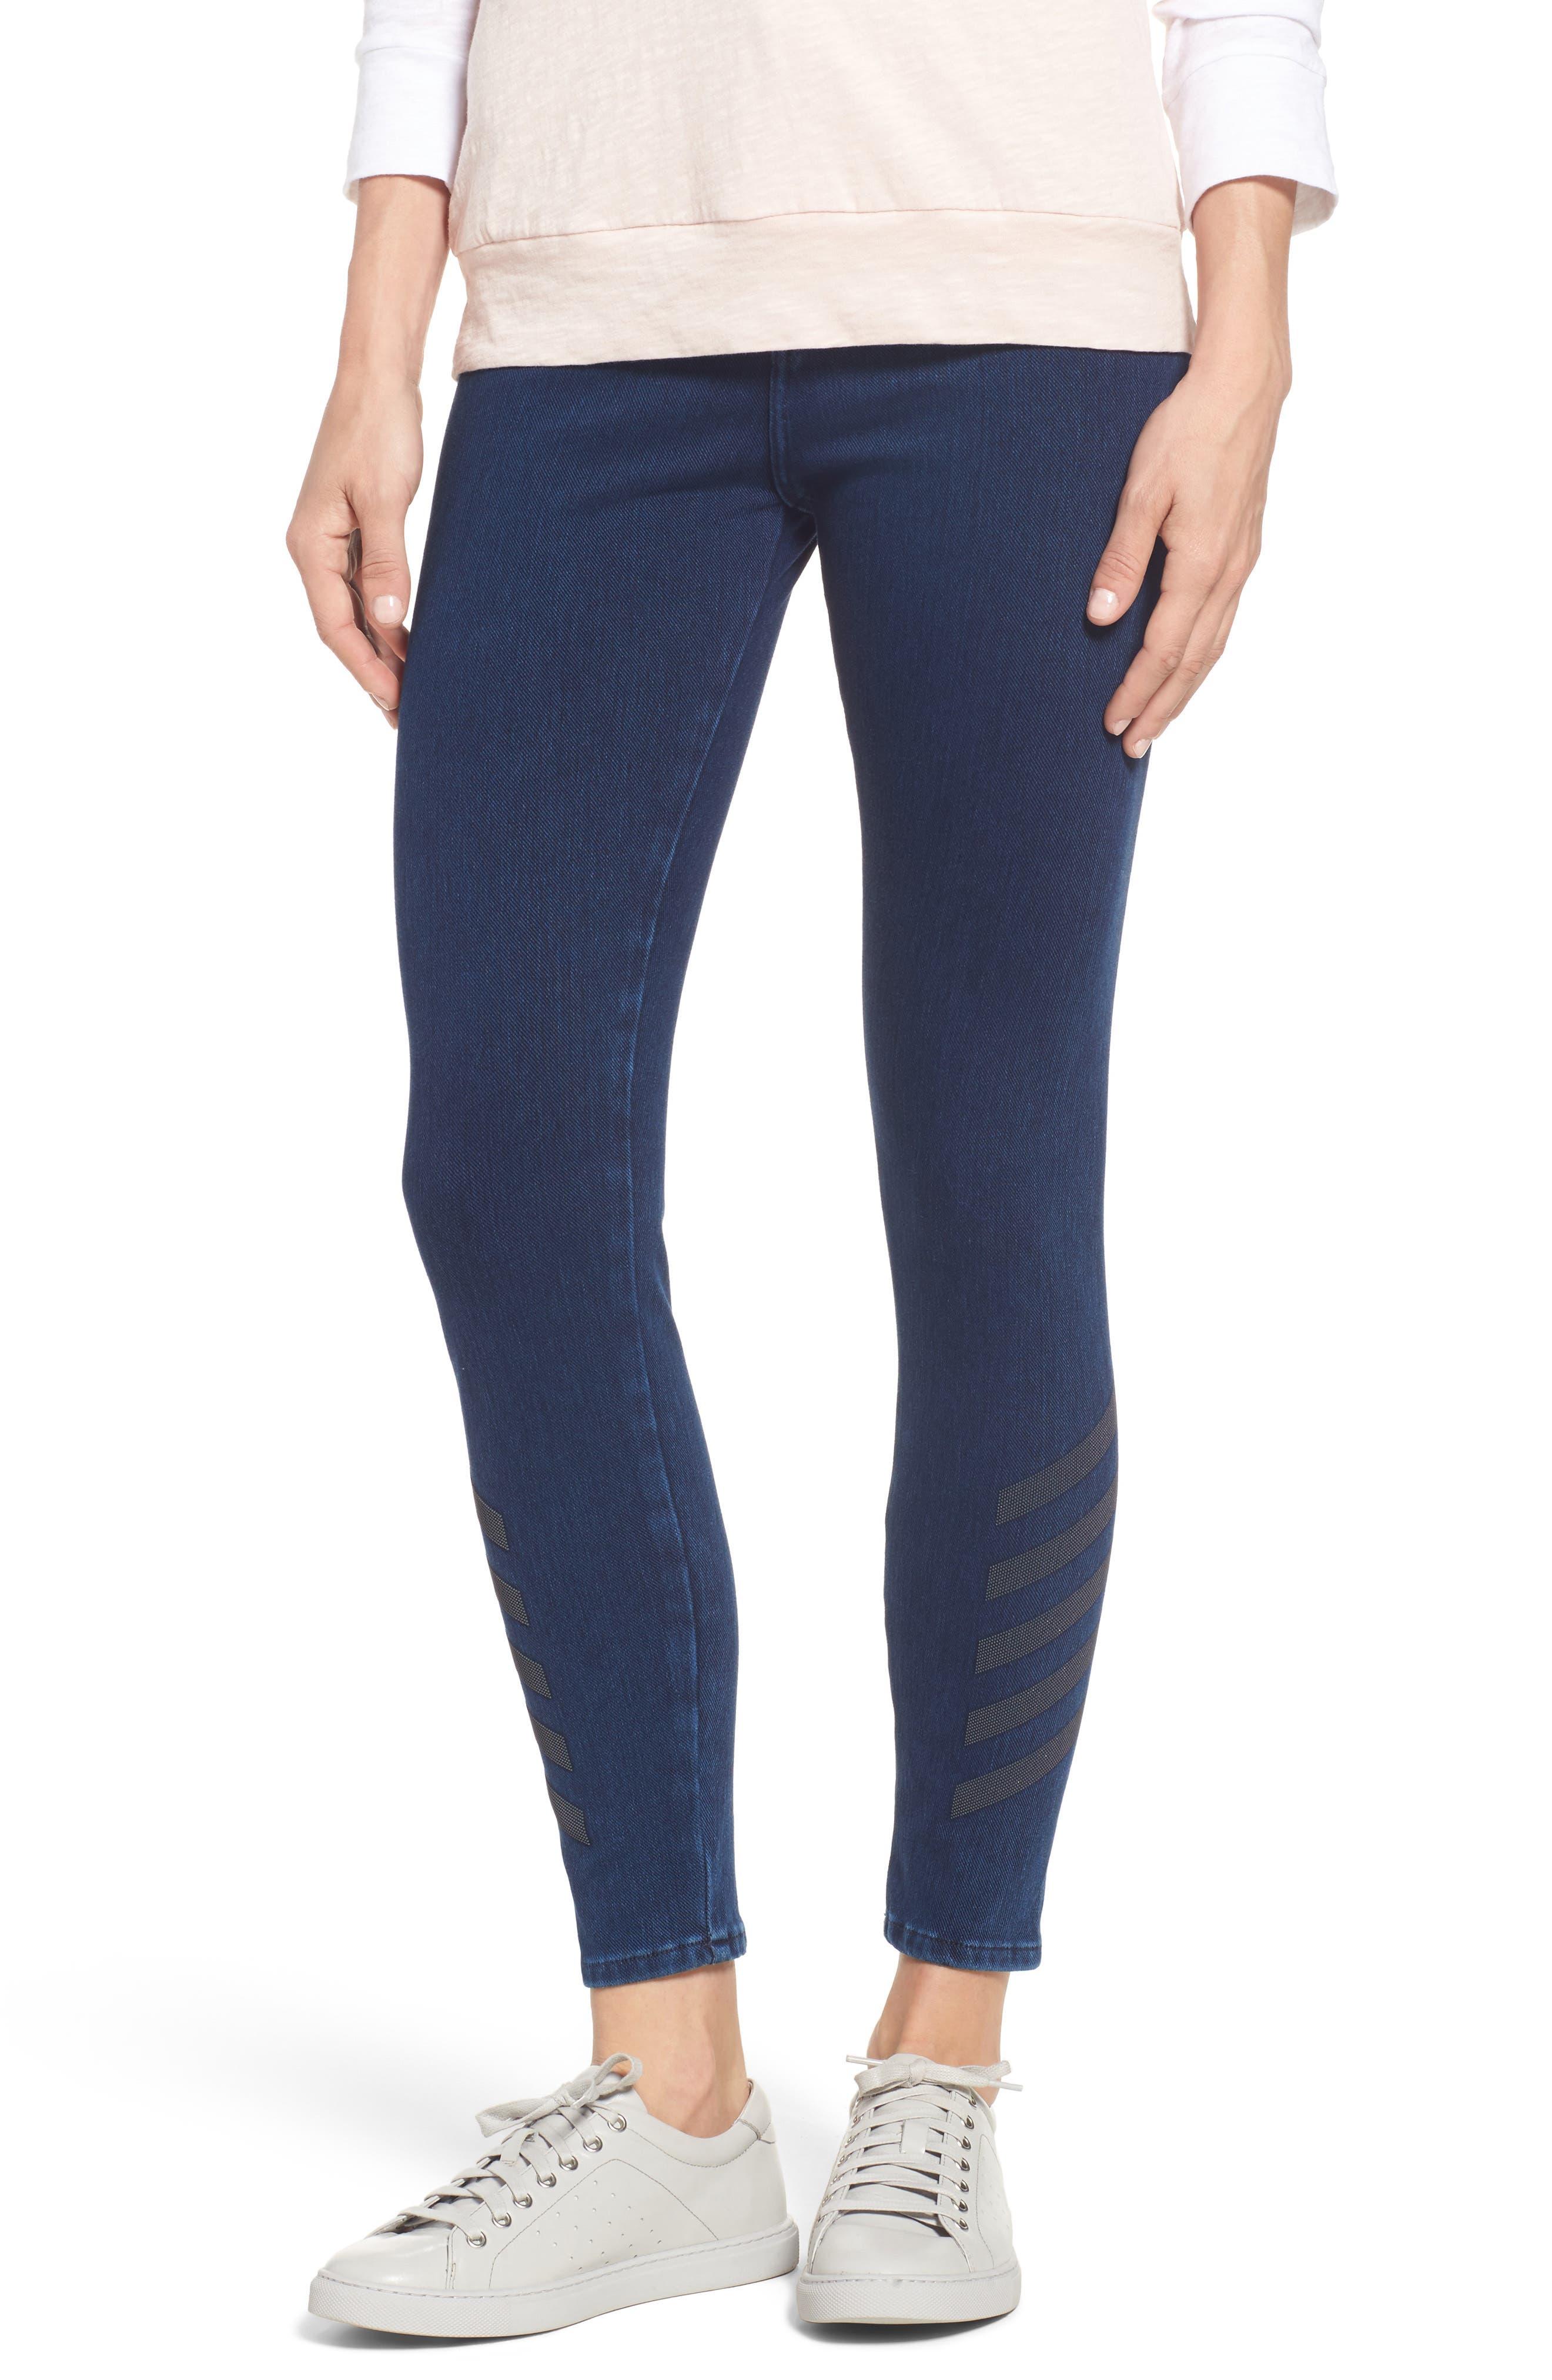 Joie Embellished High Waist Skinny Jeans,                         Main,                         color, 401